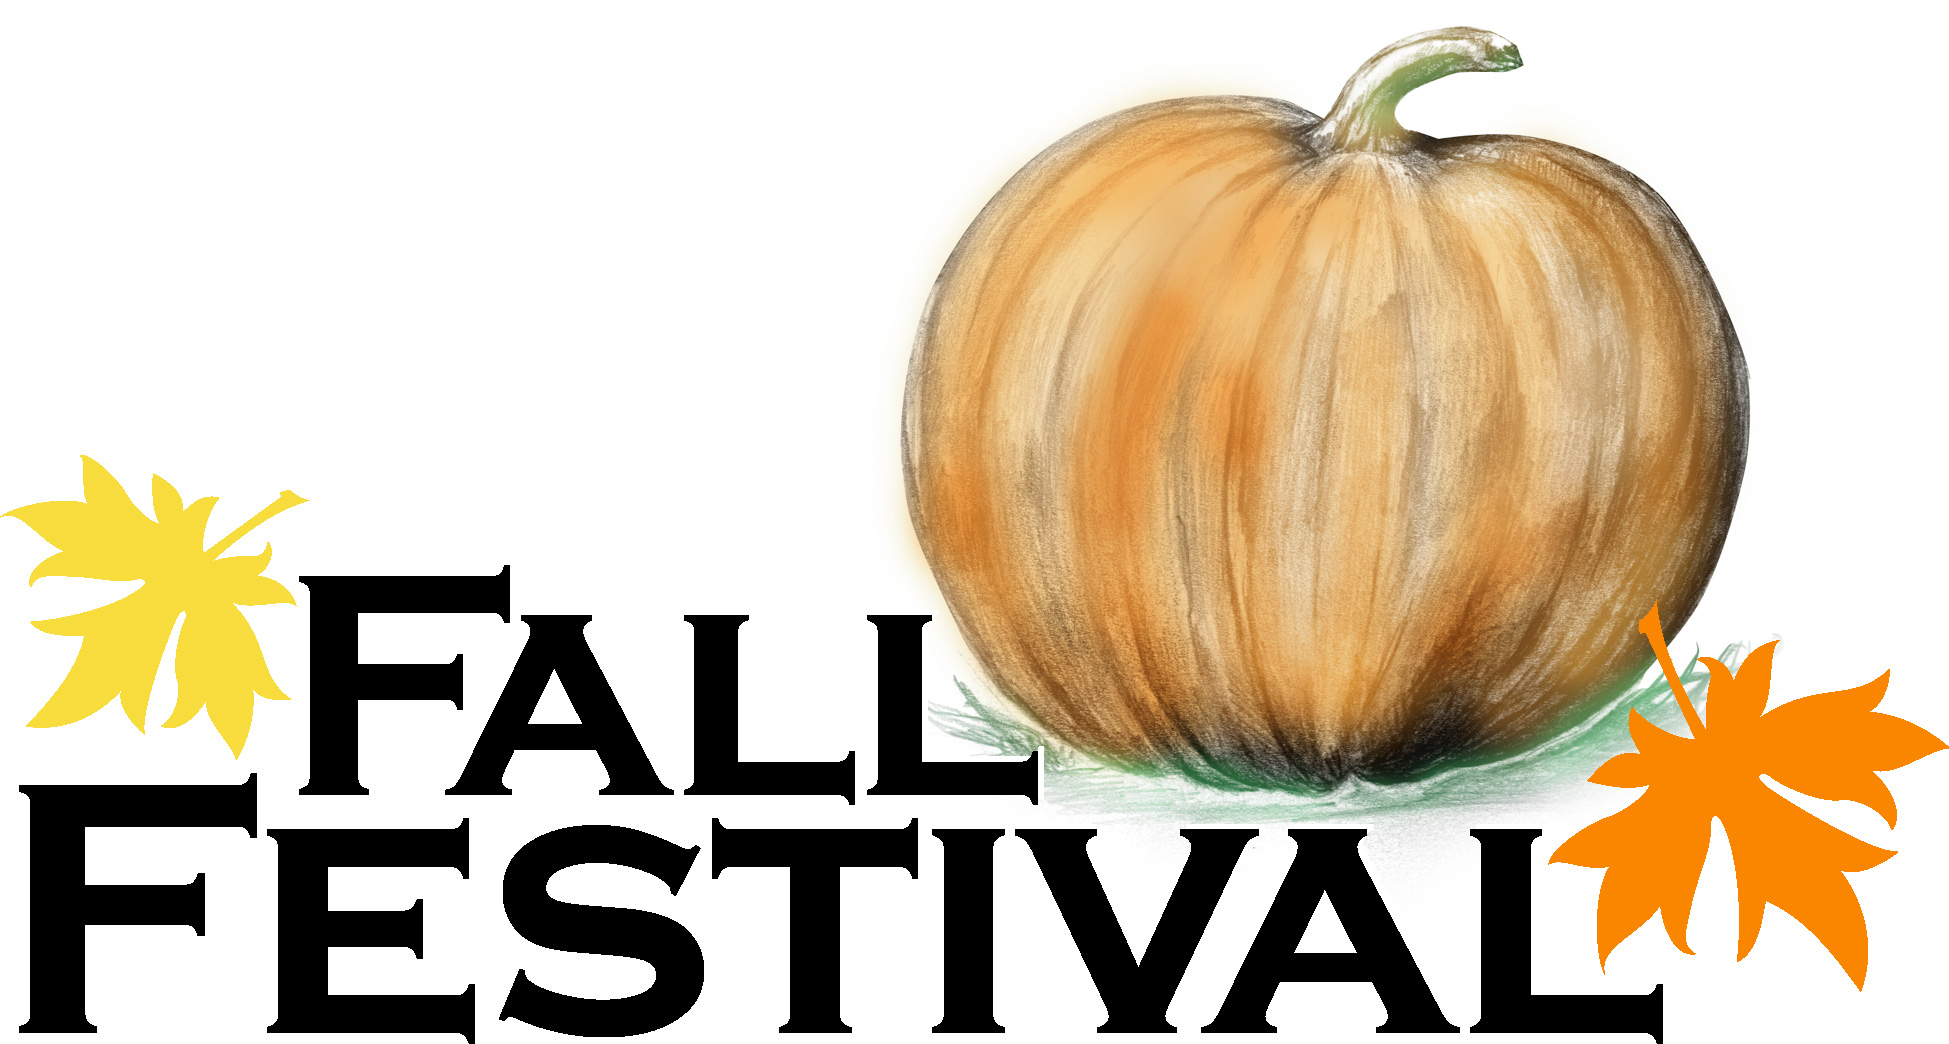 Fall festival fall family .